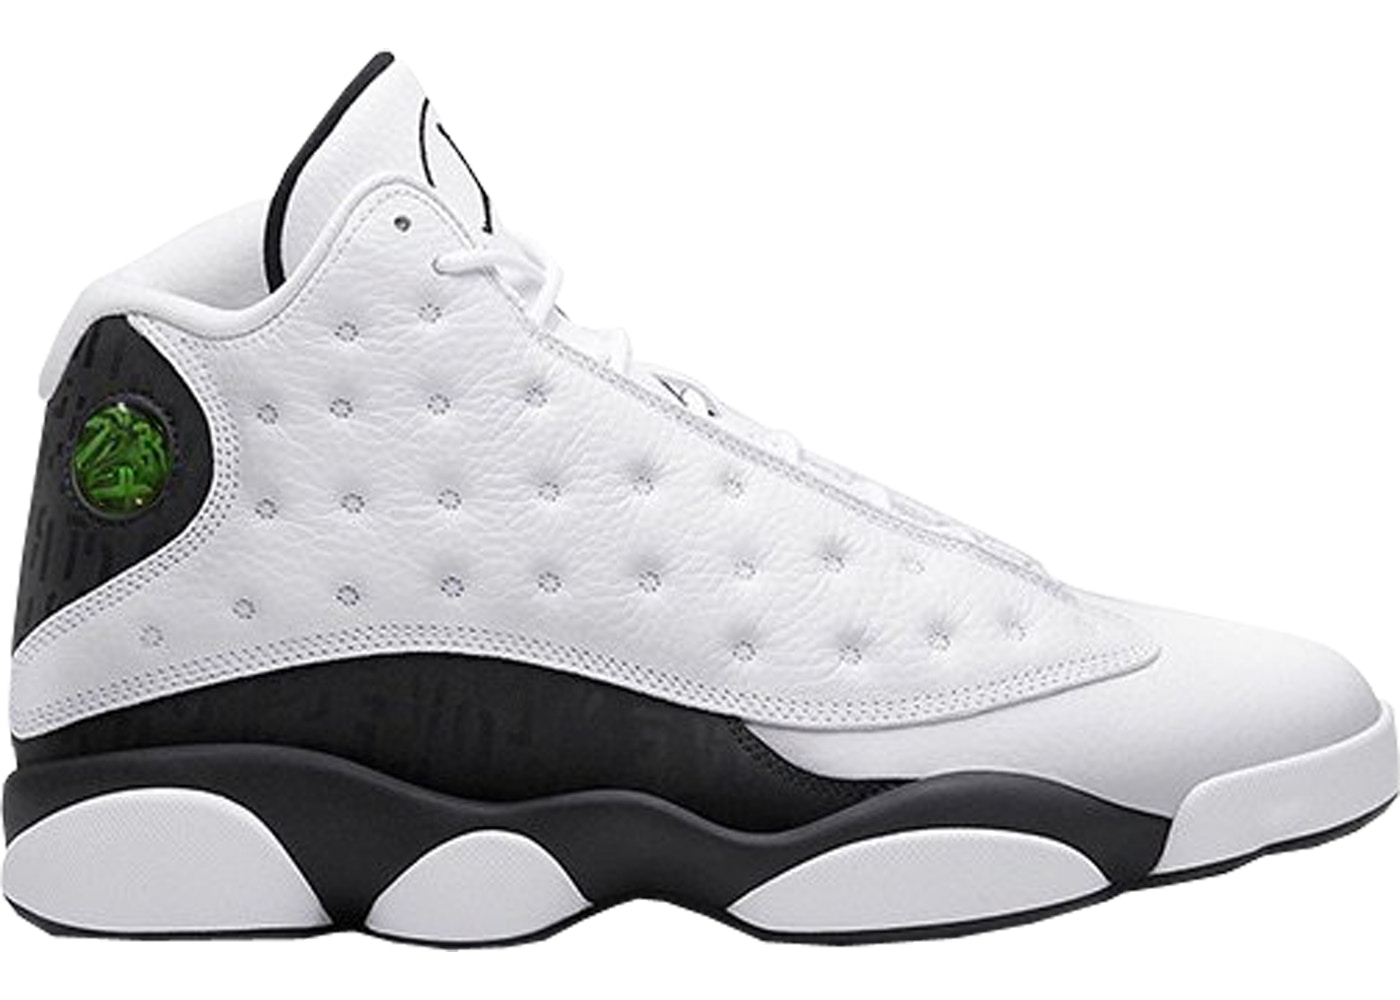 738ade2cd3f Air Jordan 13 Size 16 Shoes - Release Date